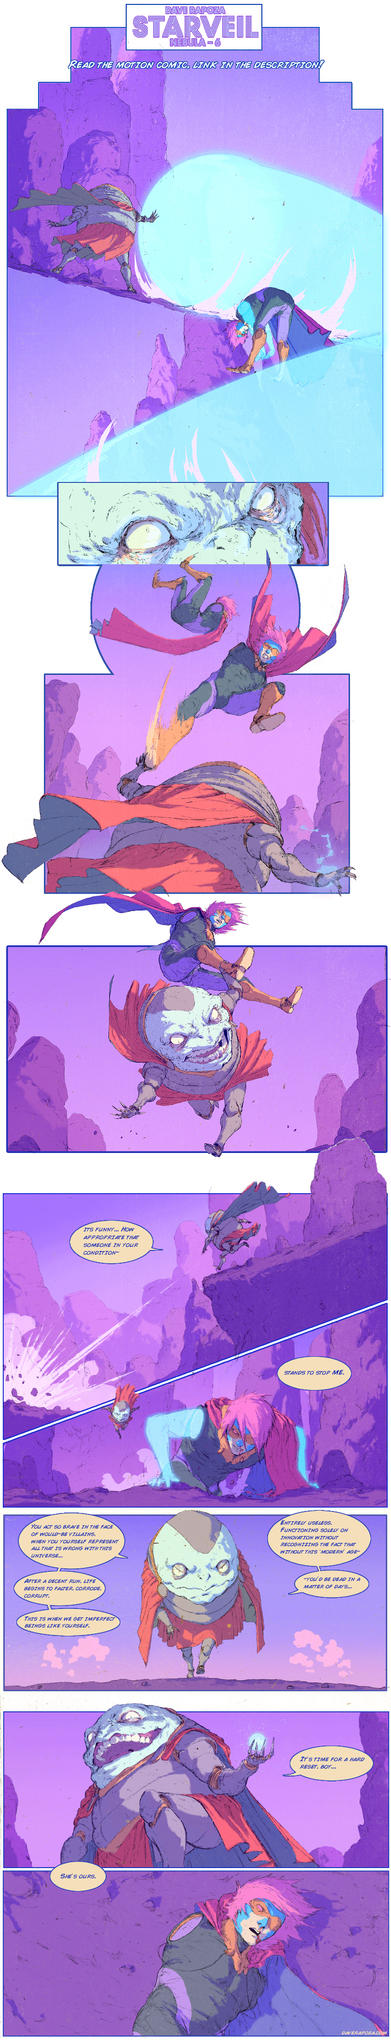 StarVeil - Nebula #6 (motion comic in description) by DaveRapoza